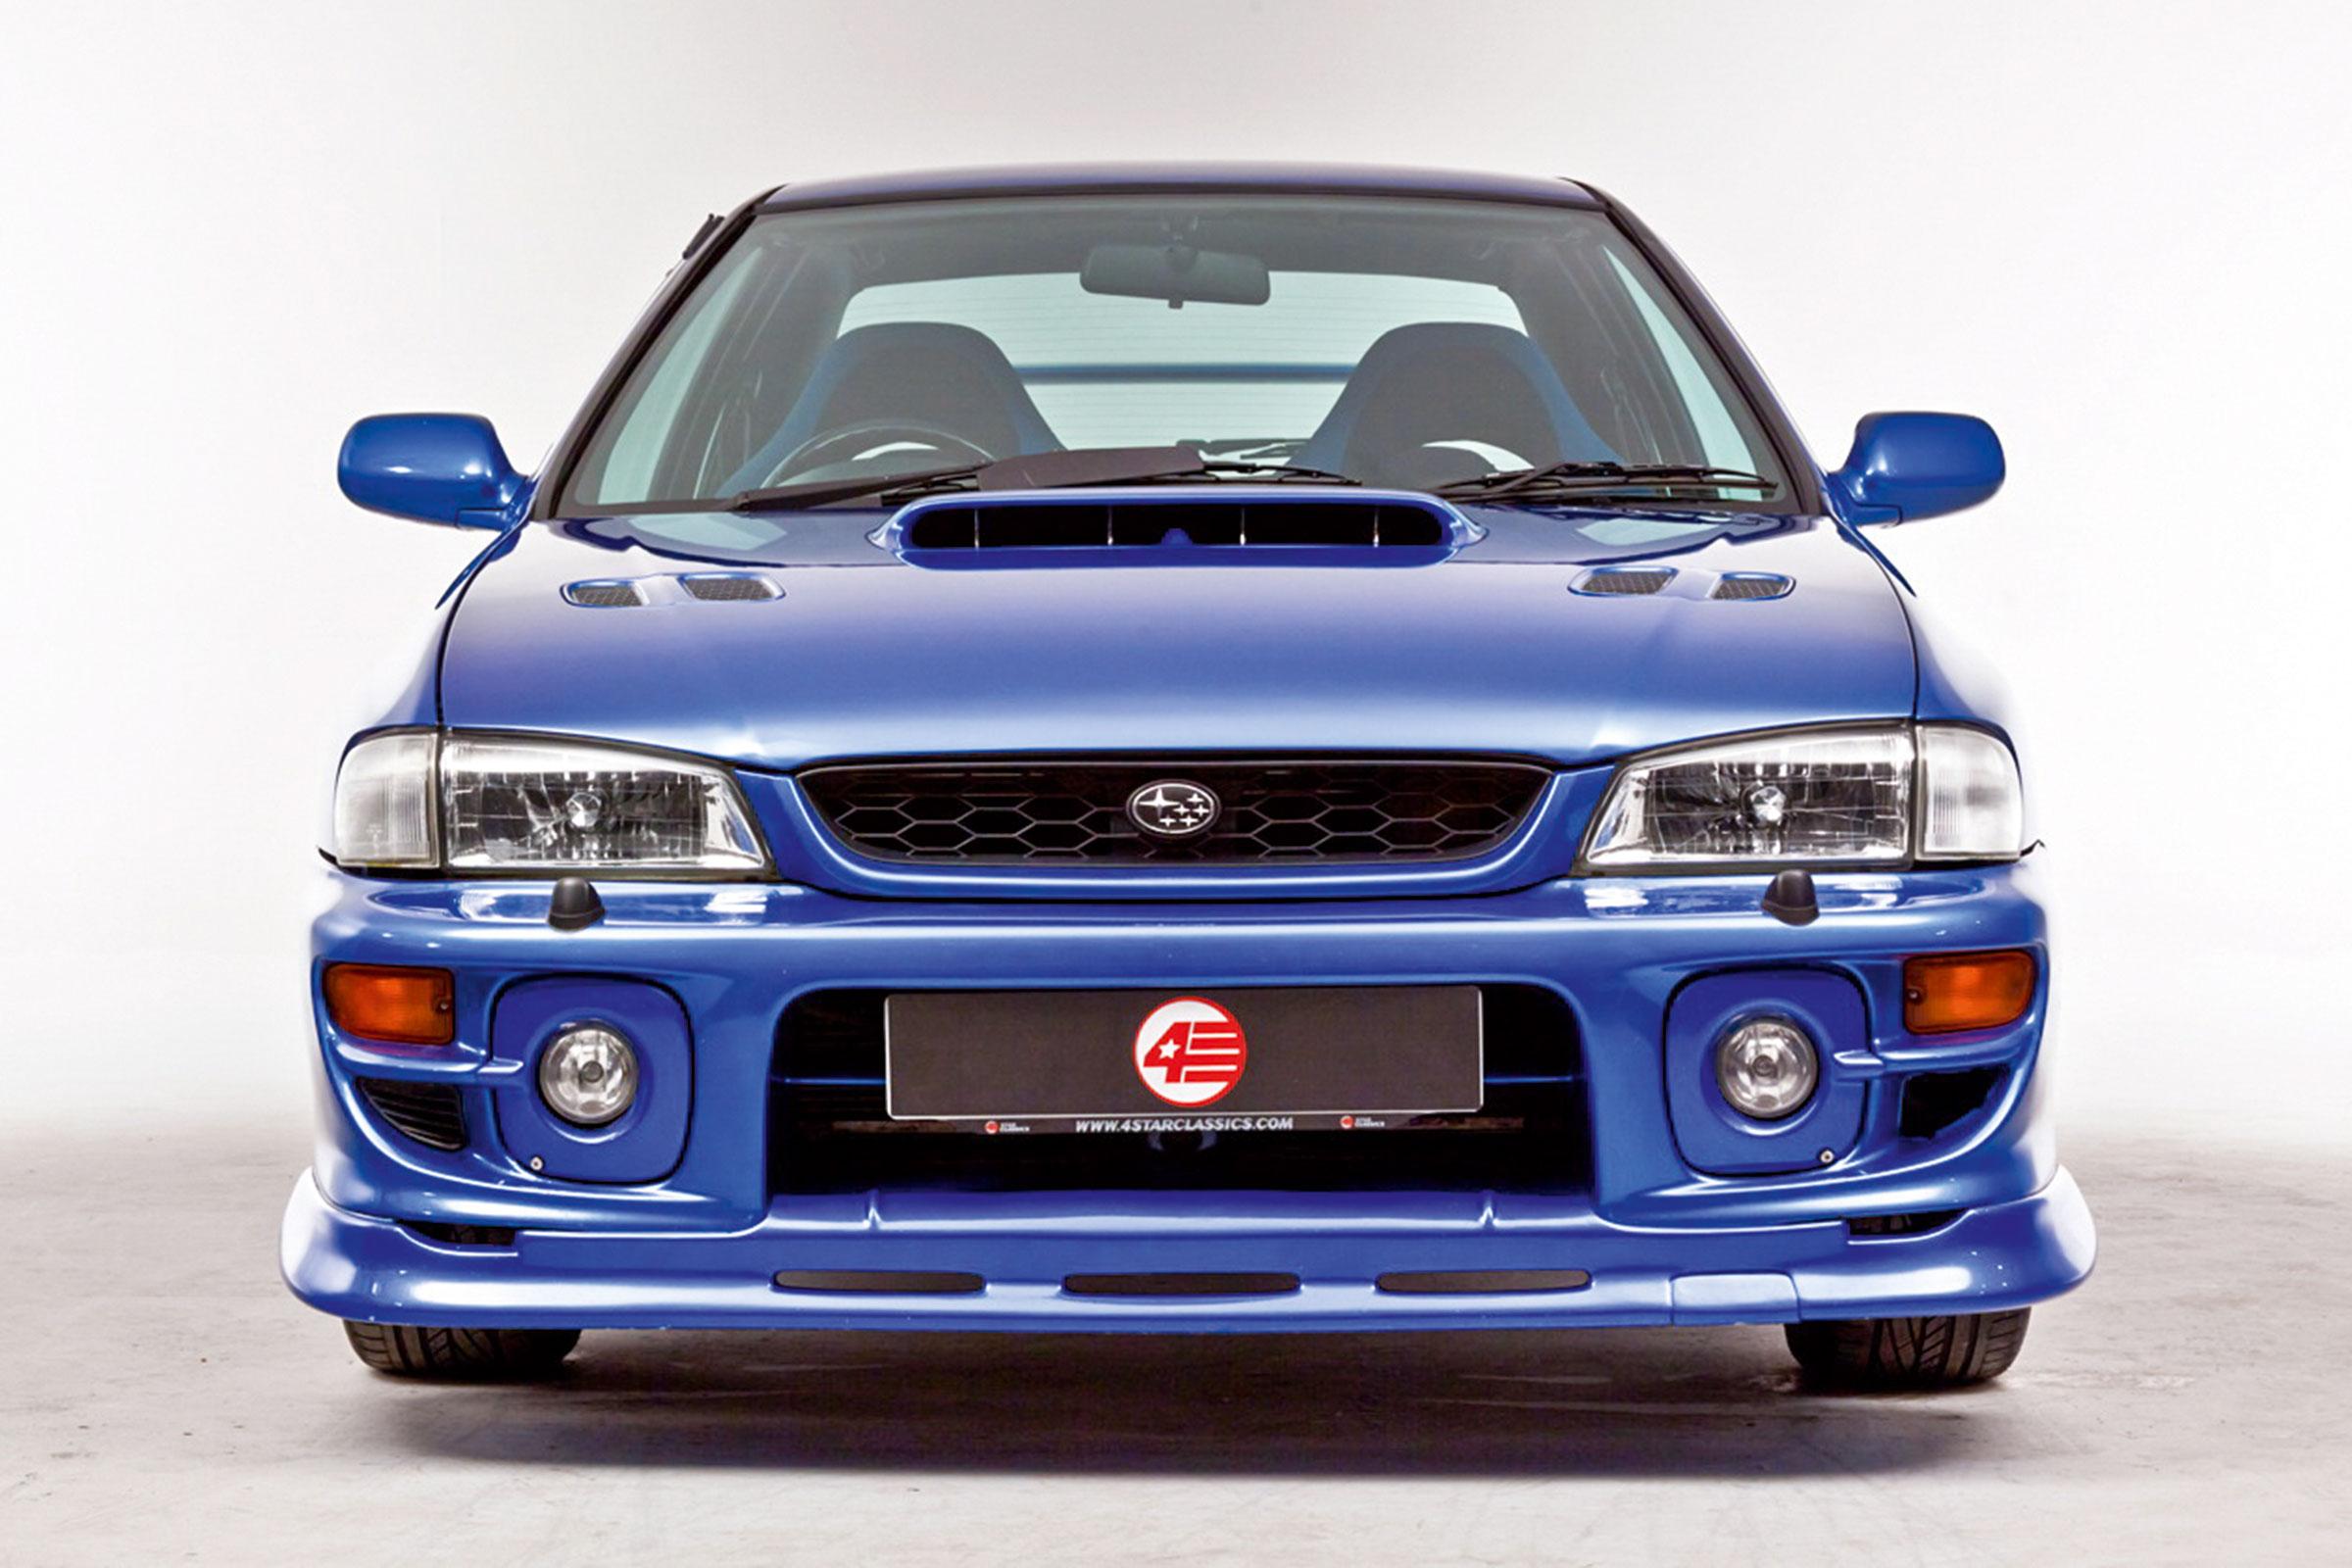 Subaru Impreza special editions Mk1 and Mk2 - 22B, RB5, P1